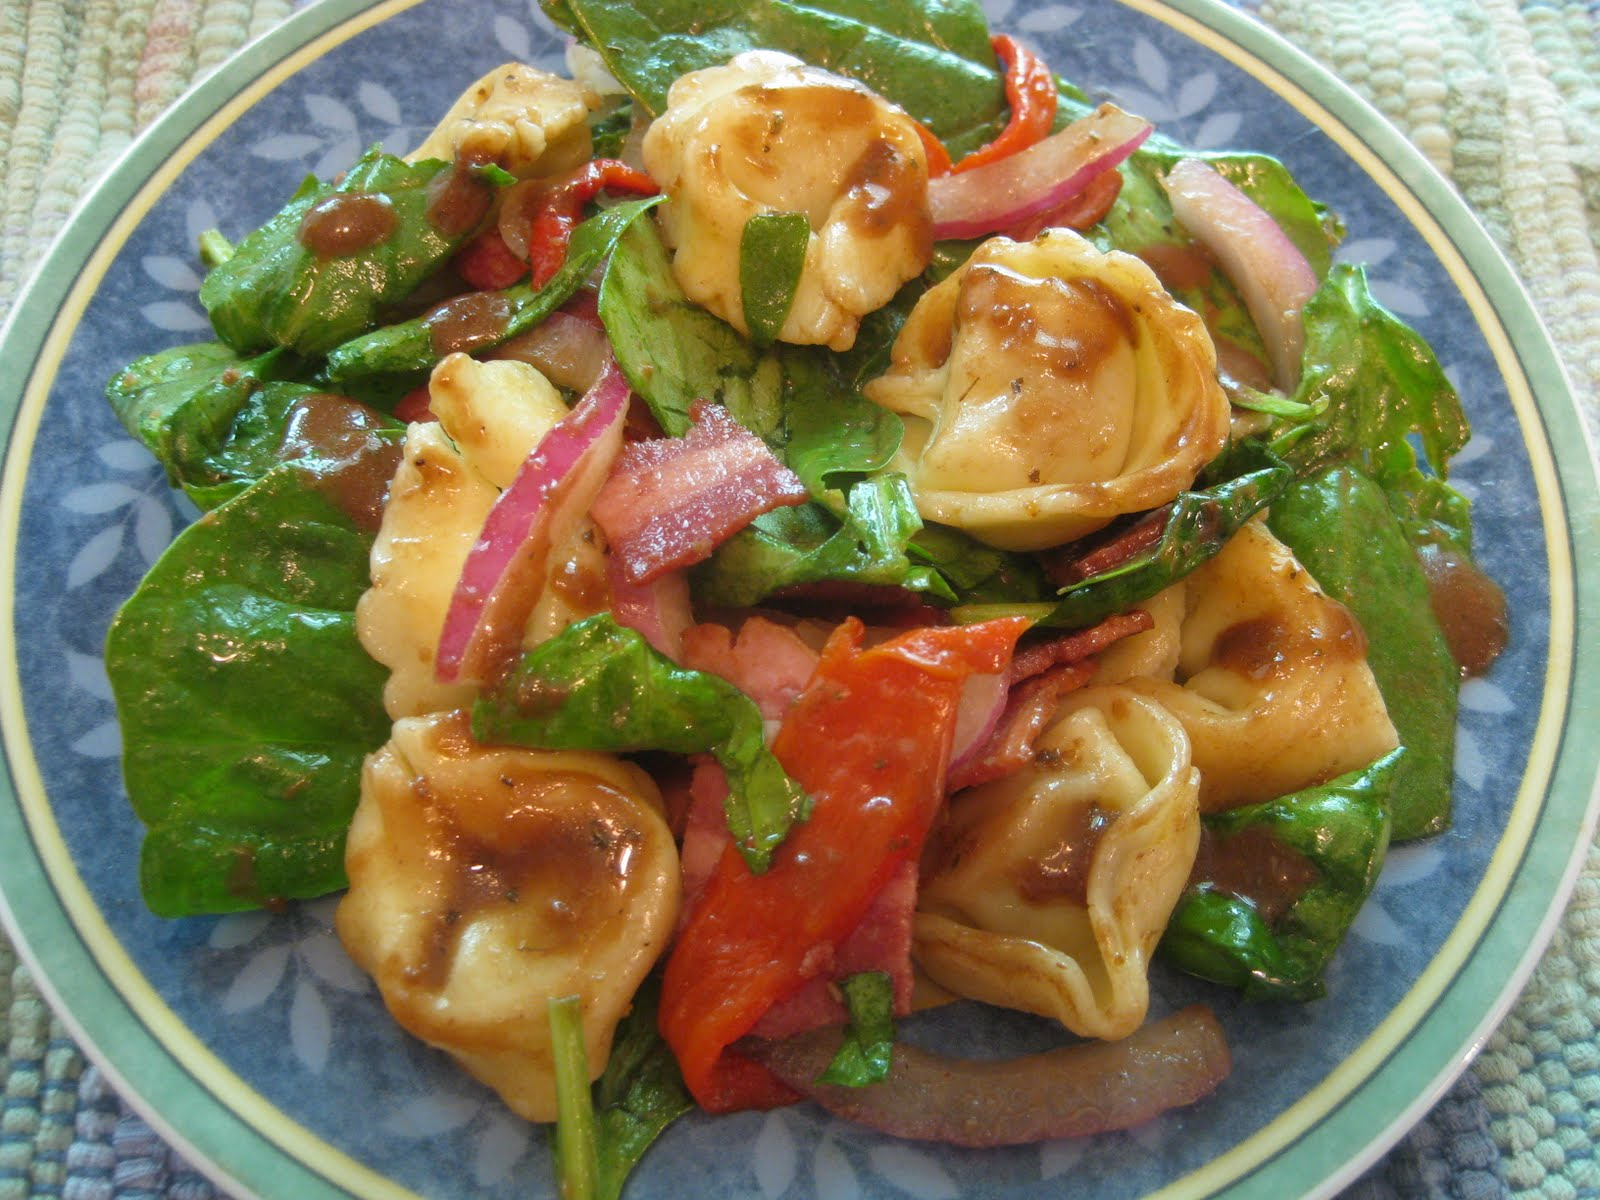 ... Mama Cooks: Tortellini Spinach Salad with Balsamic-Tomato Vinaigrette